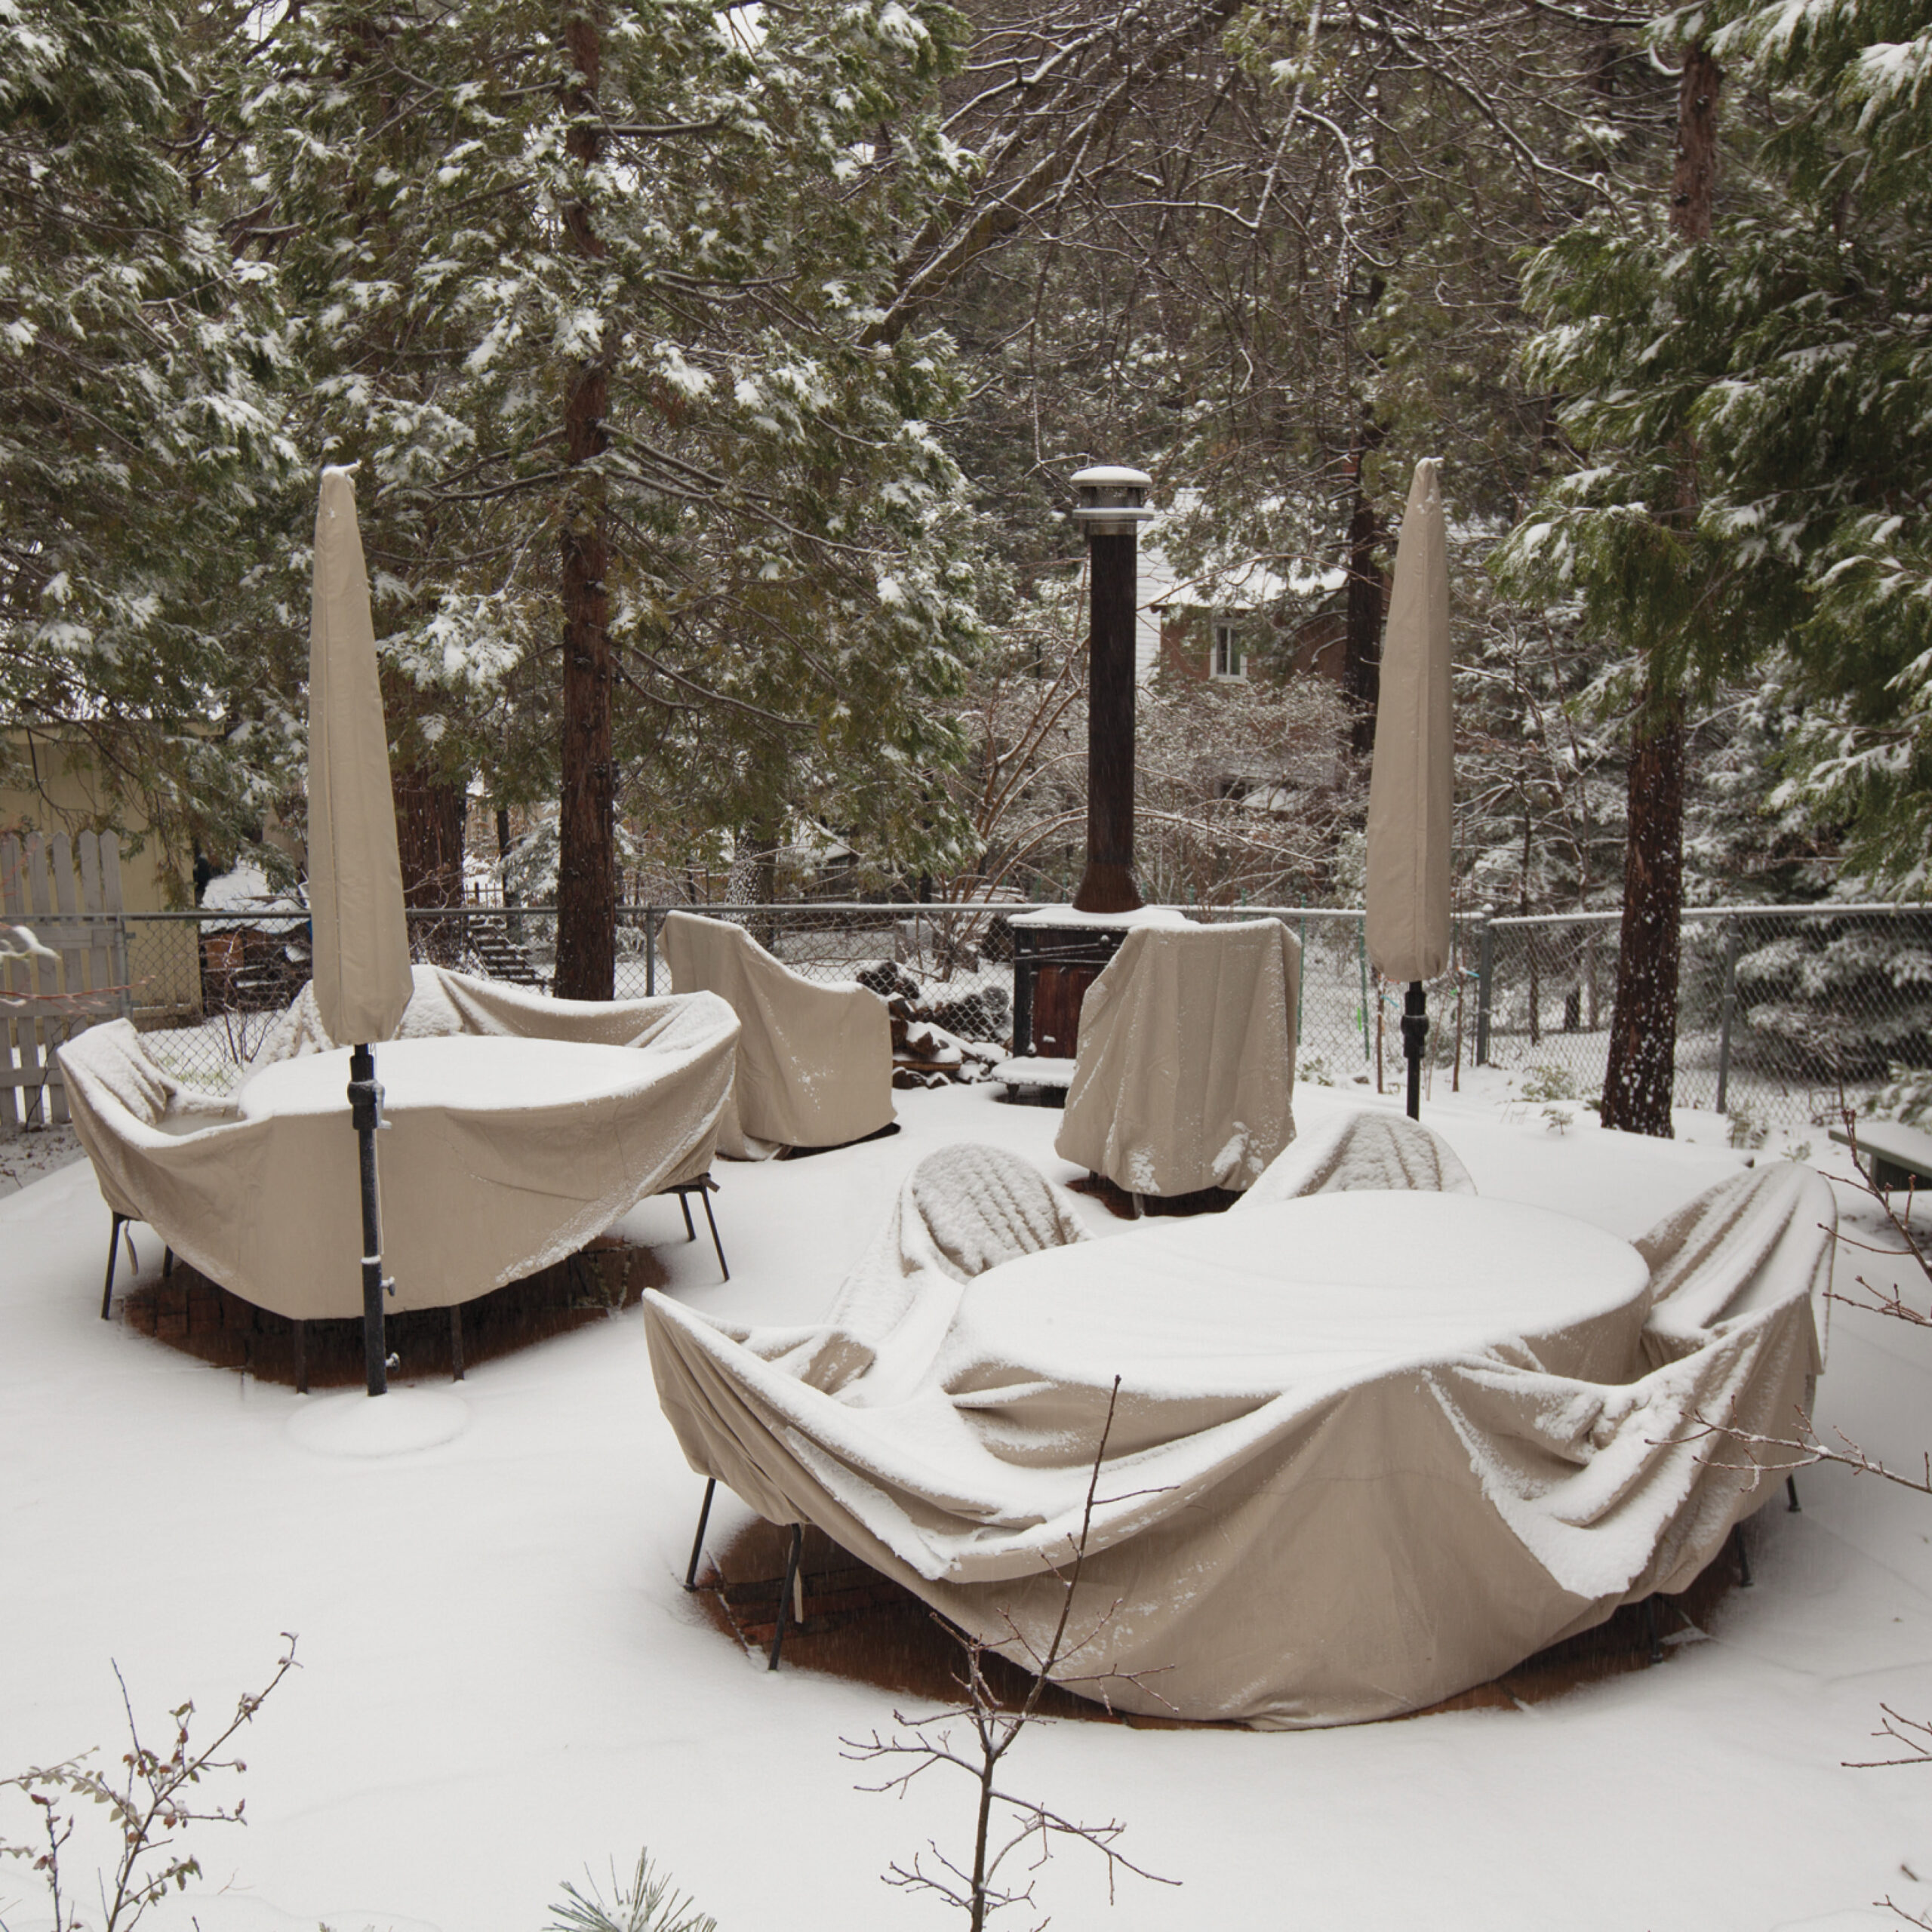 Get Treasure Garden Protective Furniture Cover for a Patio ...